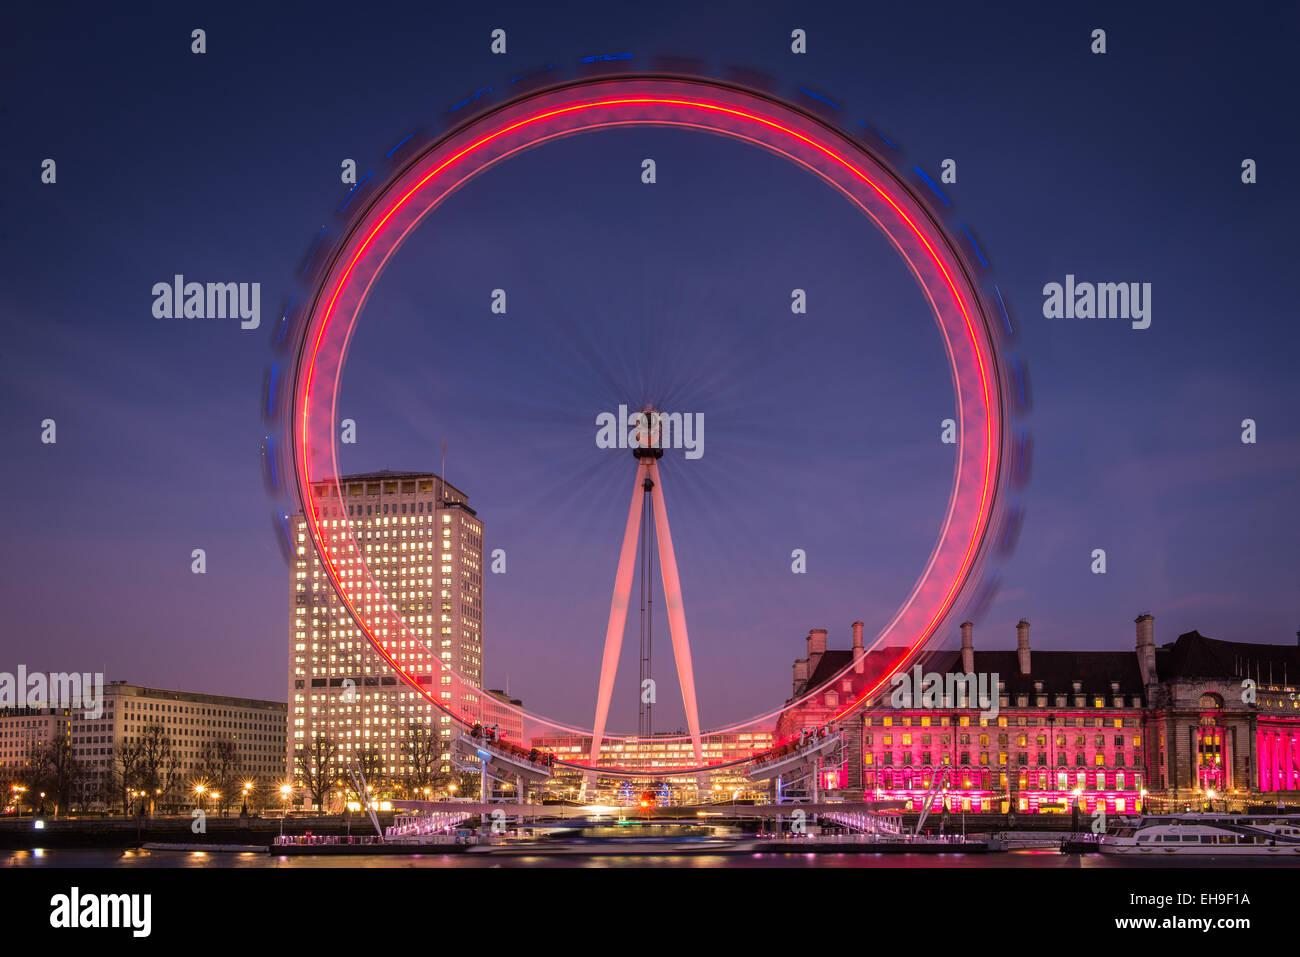 London Eye, London - Stock Image